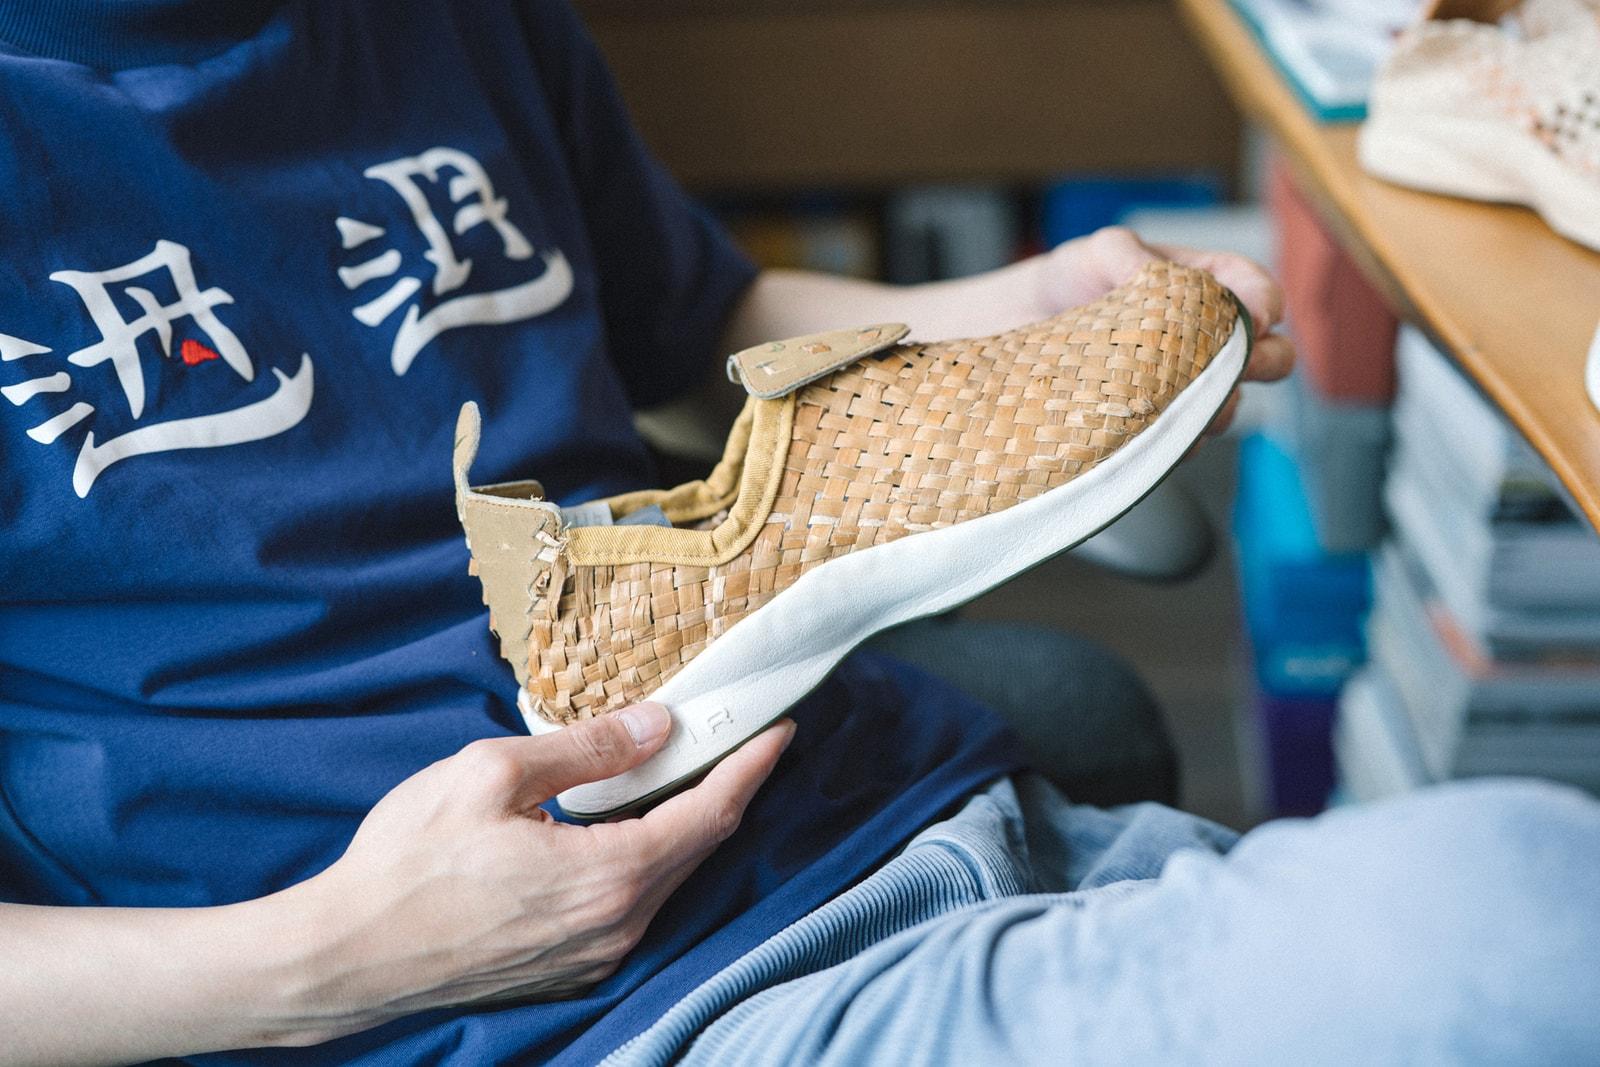 为何这双 Sample 版本的 Nike Air Woven 让 Mike Chung 惦记了十年?| Sole Mates